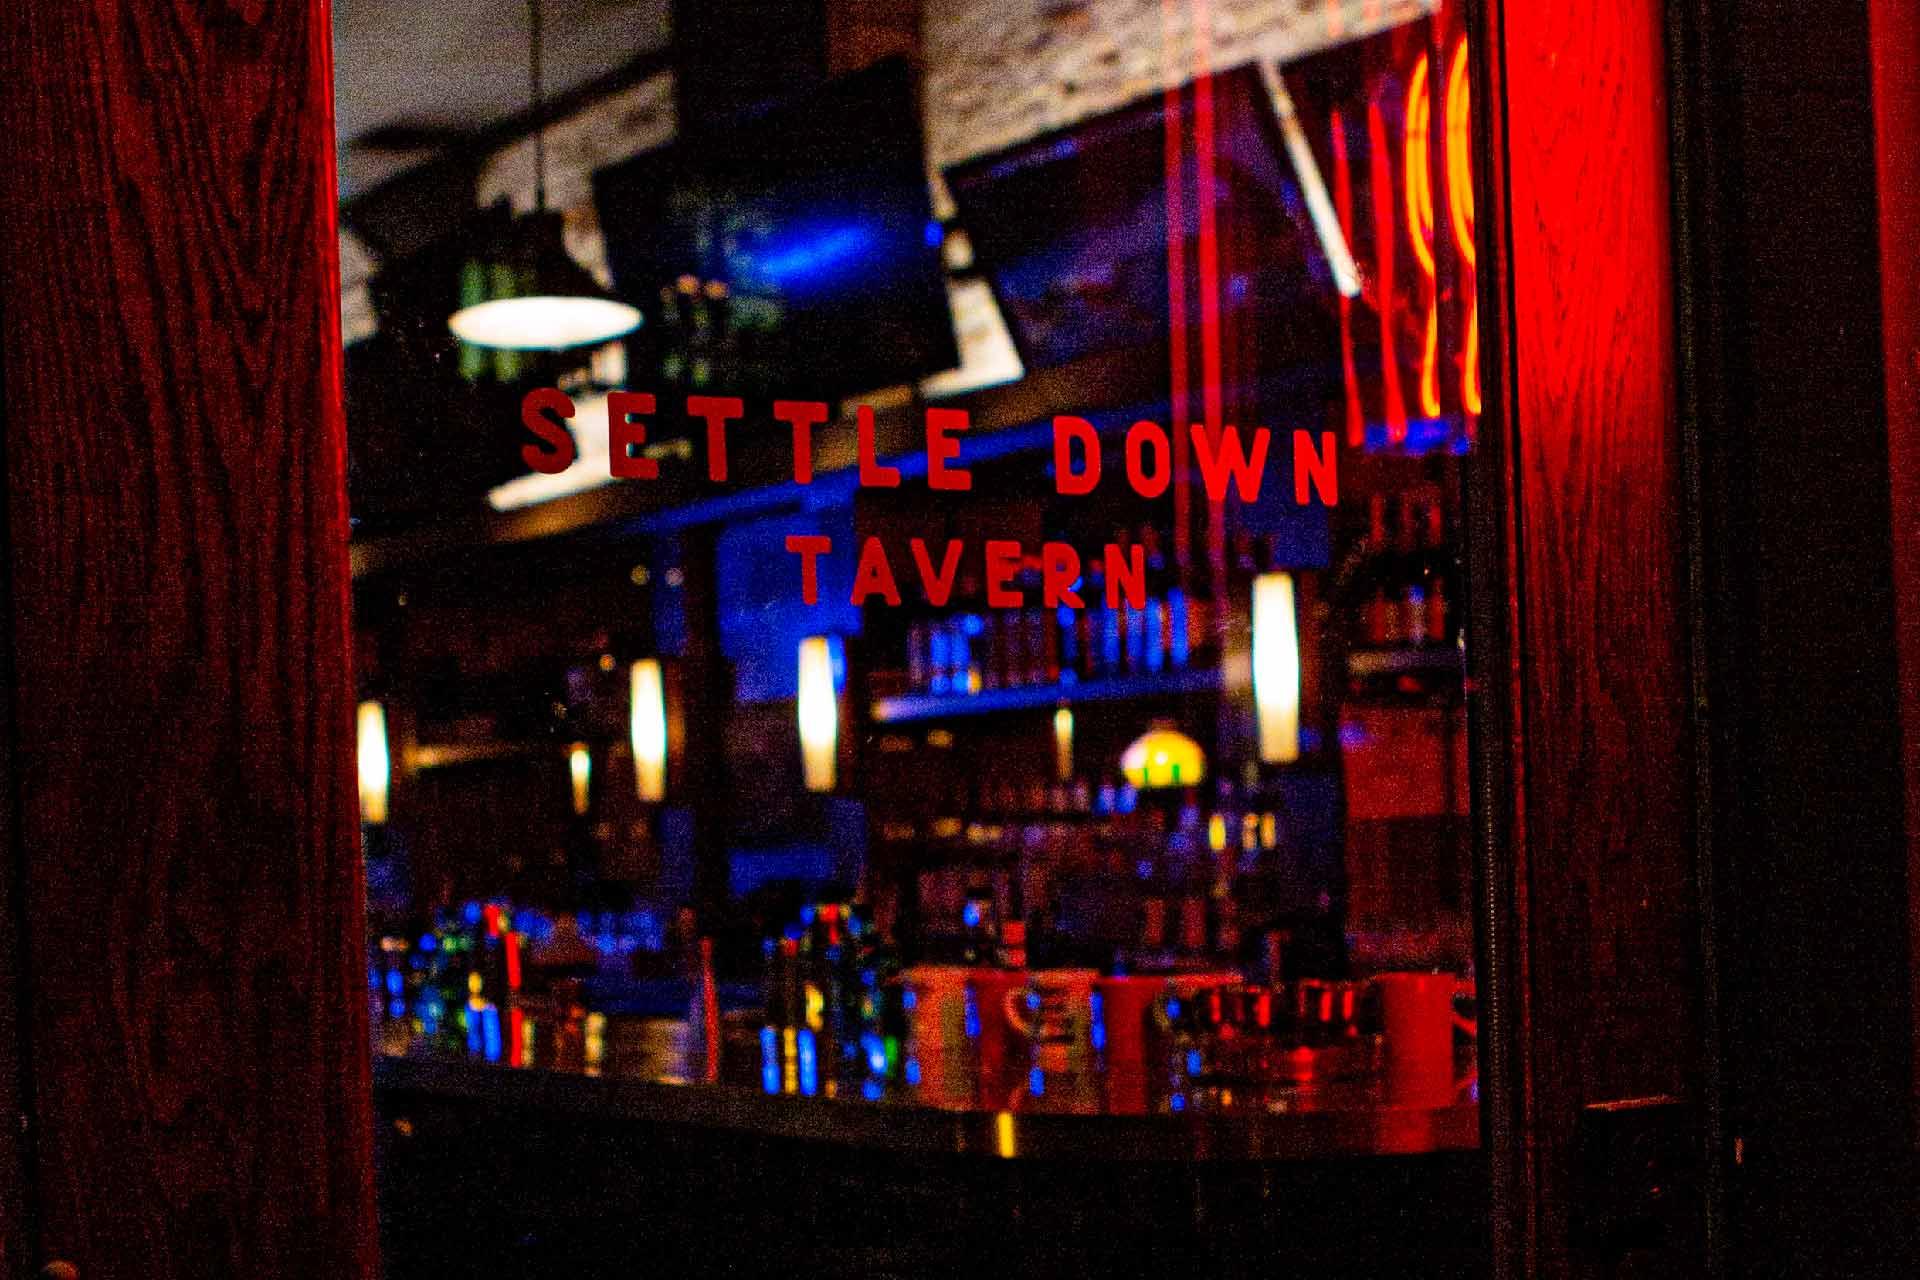 settle down tavern madison